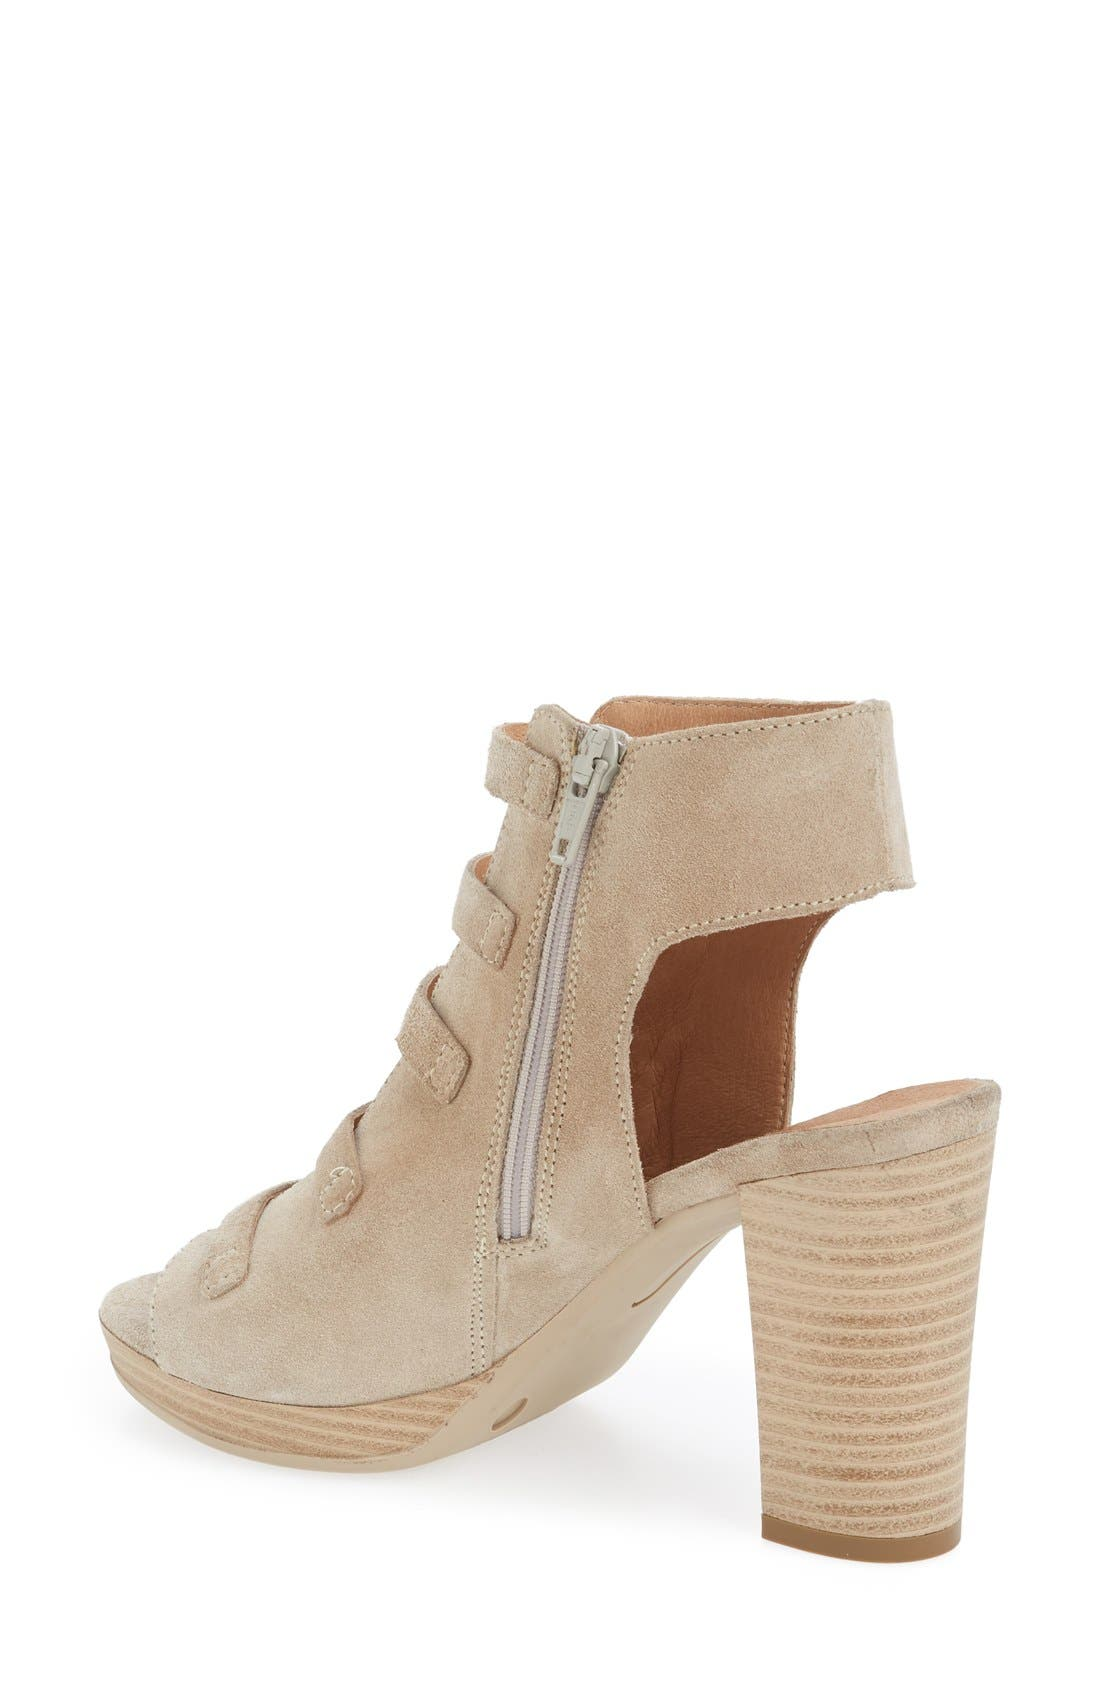 Alternate Image 2  - Kenneth Cole New York 'Kennedy' Buckle Strap Block Heel Sandal (Women)